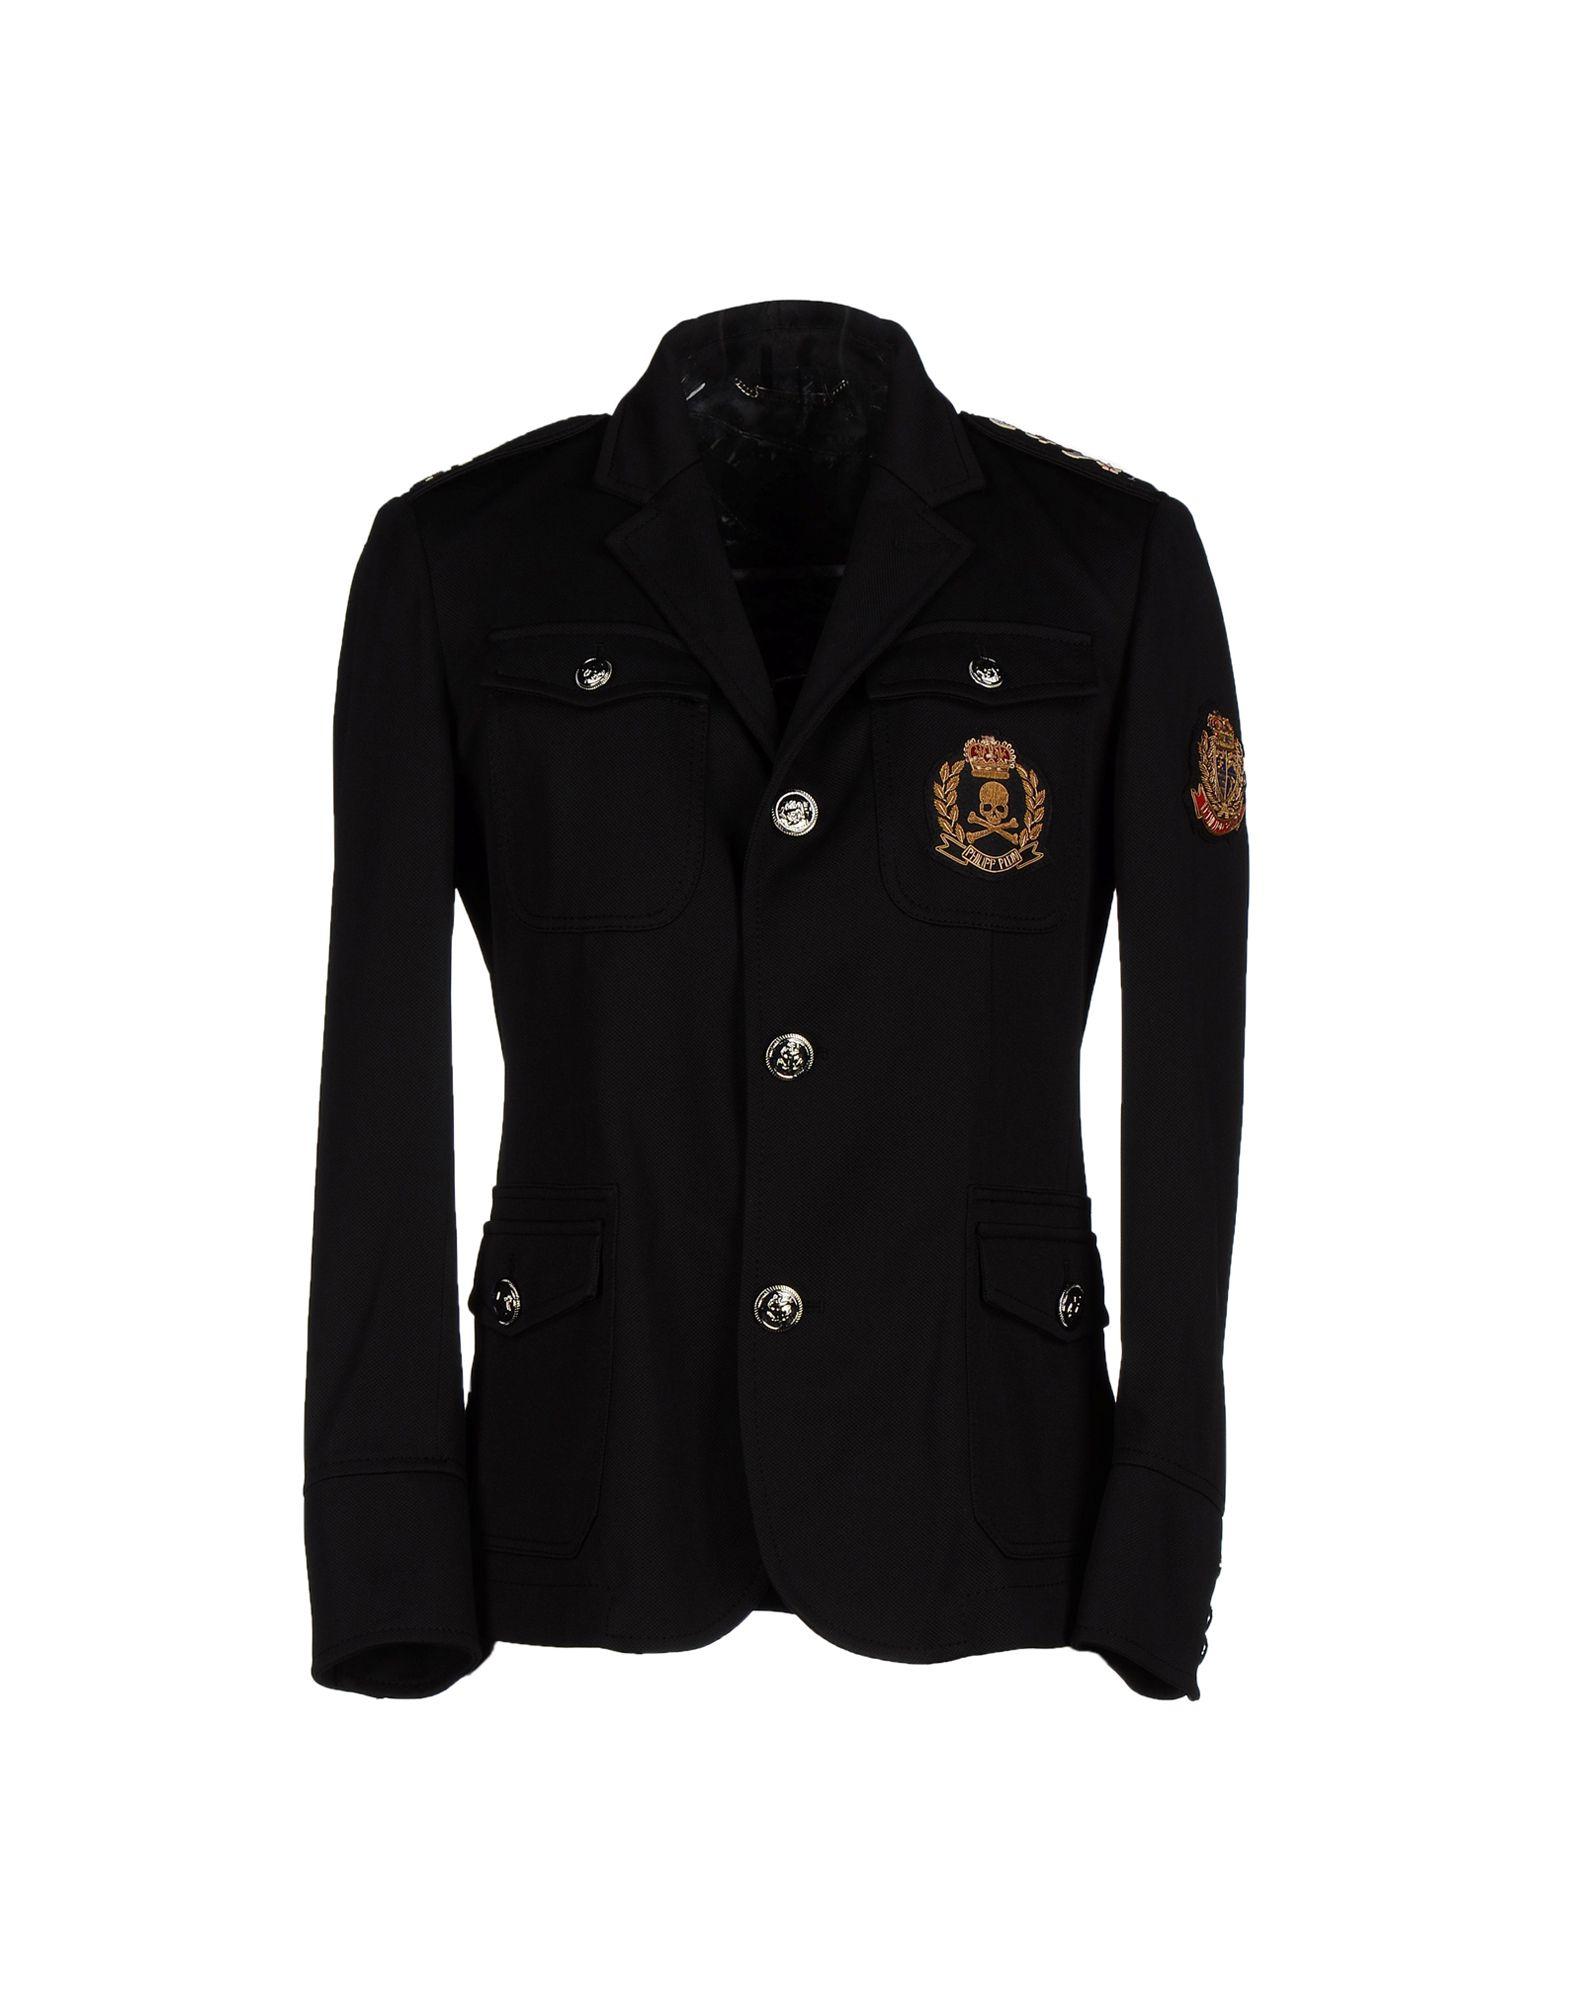 philipp black singles Philipp plein the perfect mix biker jacket where to buy  single breasted  men clothing,philipp plein clothing philipp plein jeans black .